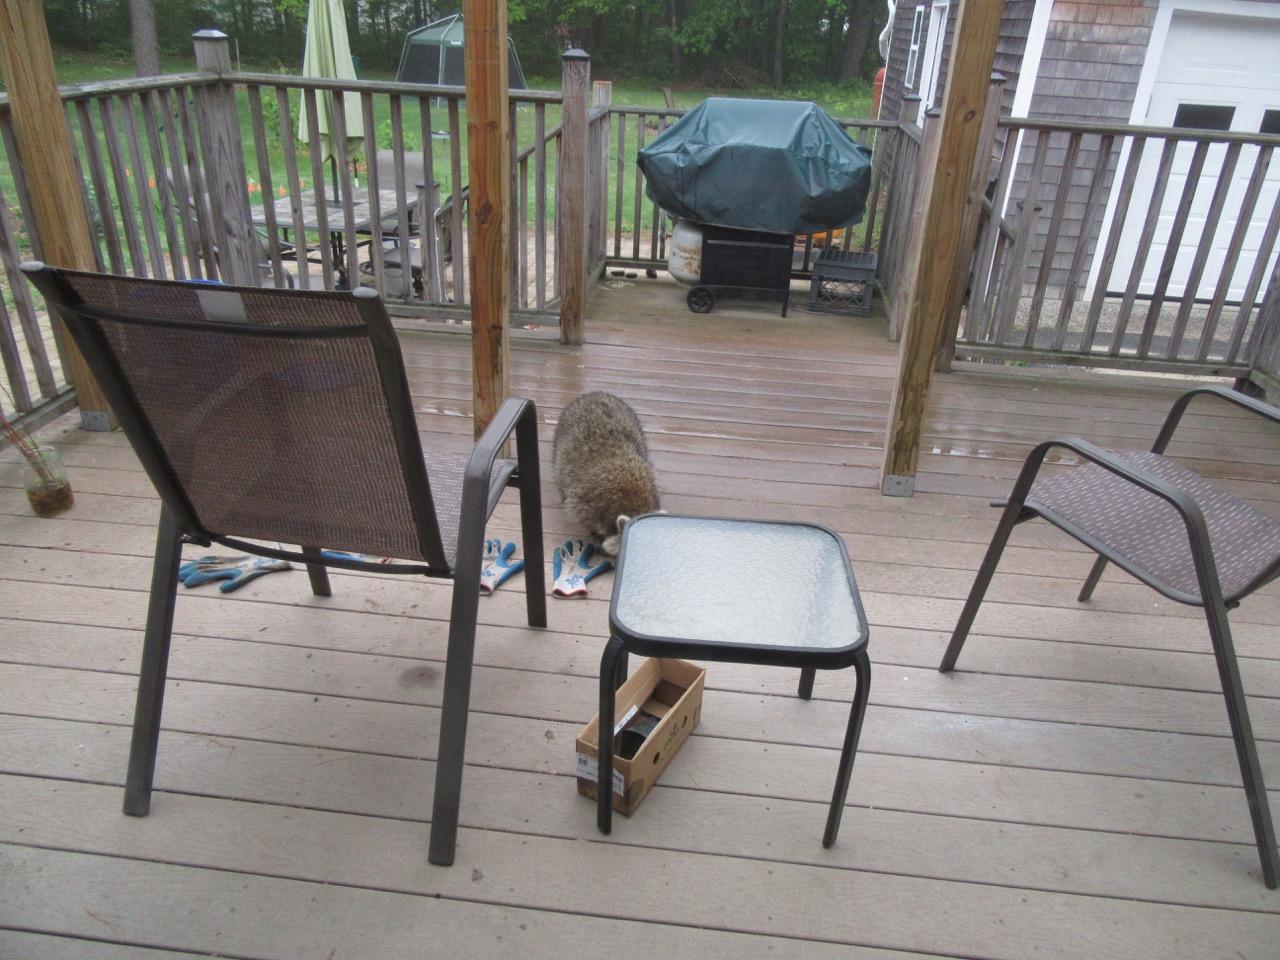 Raccoon on the deck